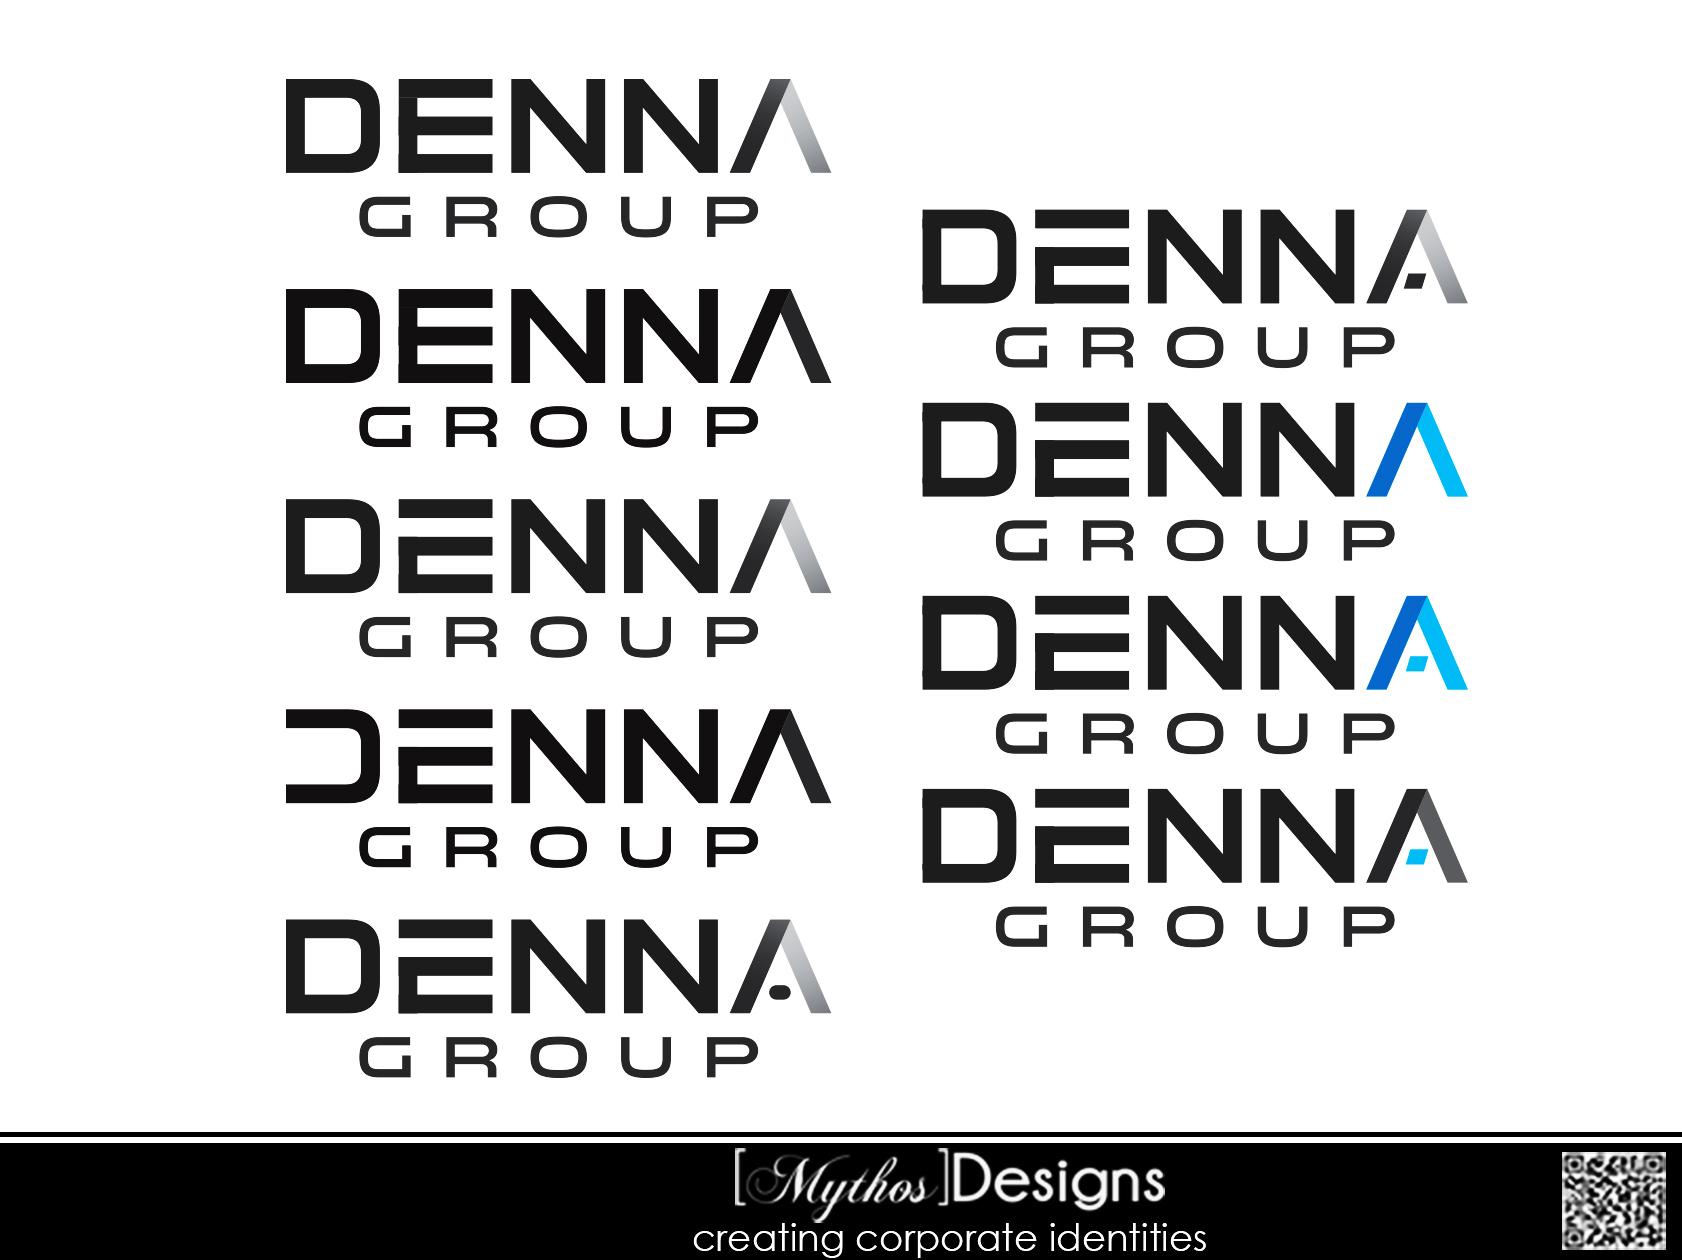 Logo Design by Mythos Designs - Entry No. 208 in the Logo Design Contest Denna Group Logo Design.